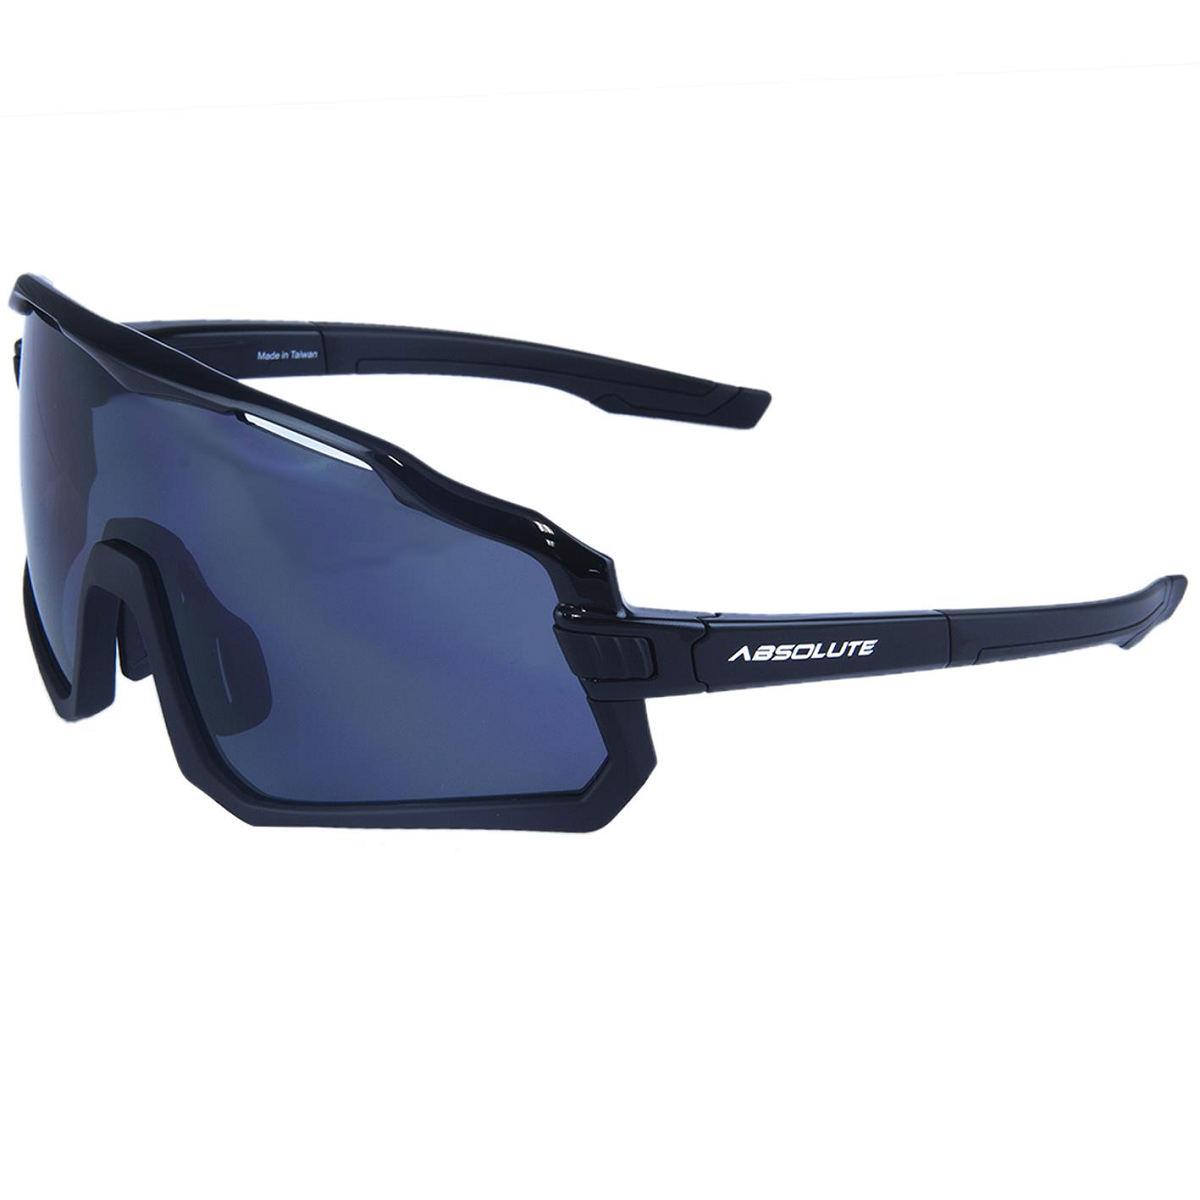 Oculos Absolute Wild Pto., Lente Fume